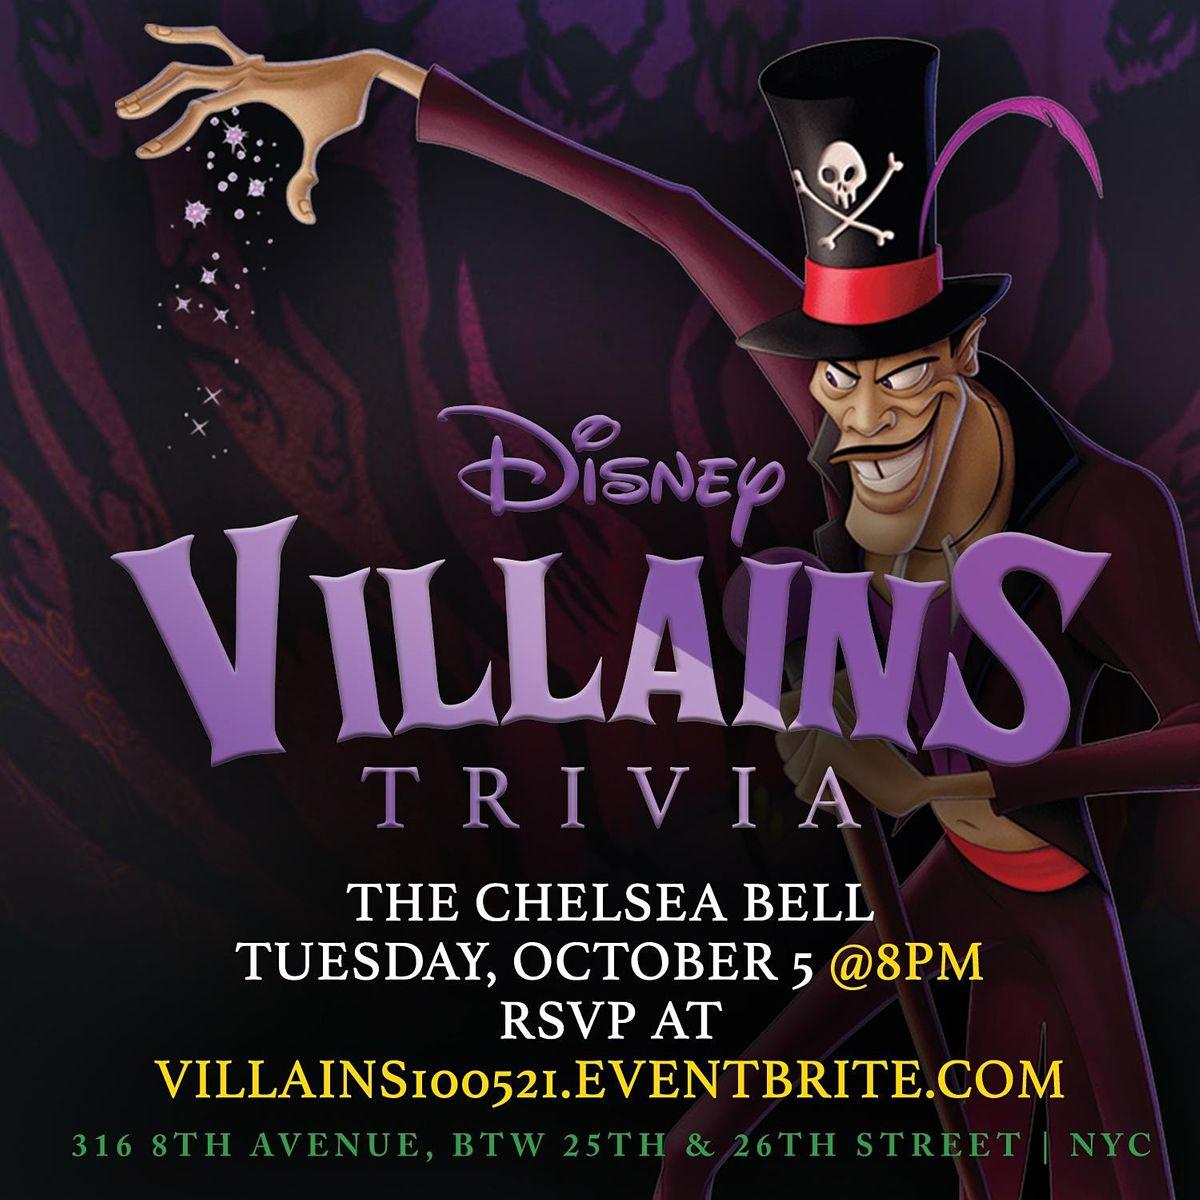 Disney Villains Trivia, 5 October   Event in New York   AllEvents.in